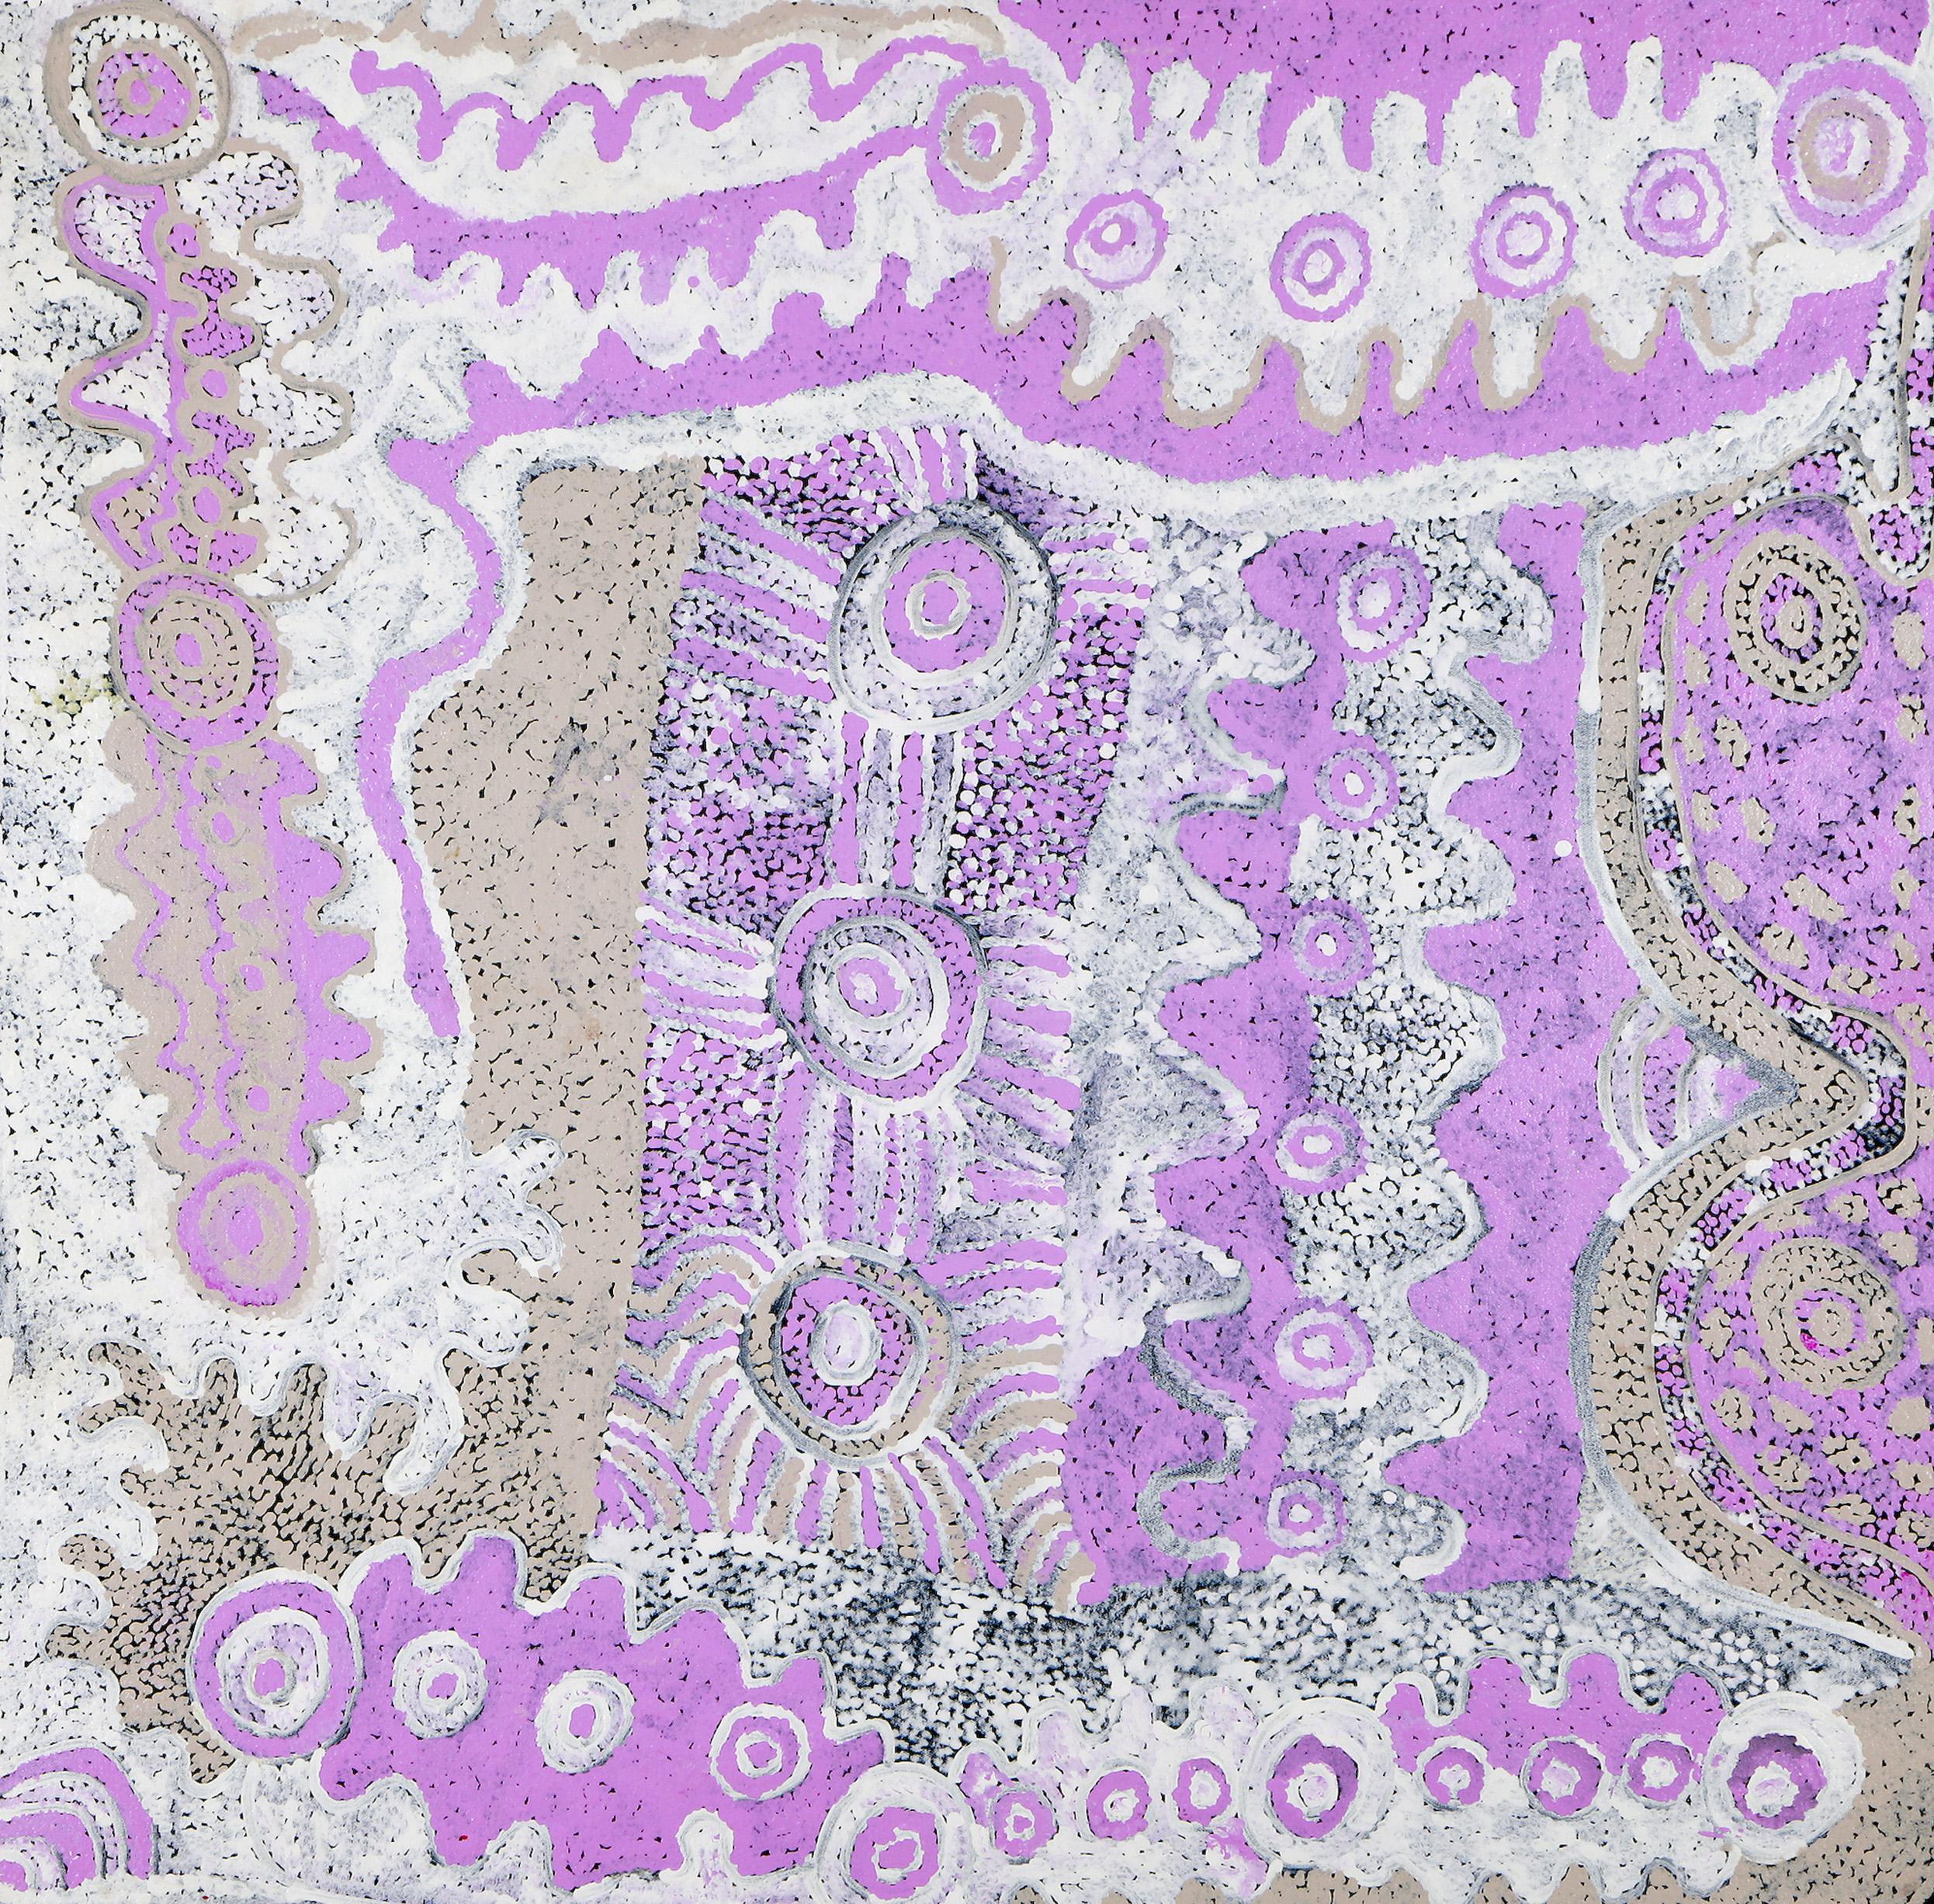 Malara, 2012  100 x 100 cm Acrylic on Canvas Ernabella Arts Catalog #58-13   EMAIL INQUIRY